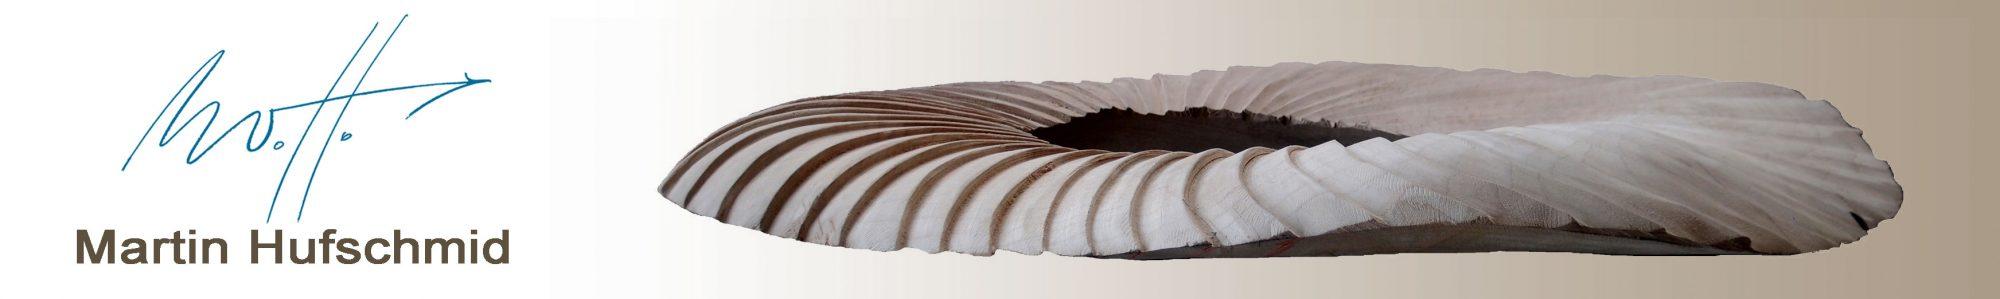 Objekte  |  Skulpturen  |  Design